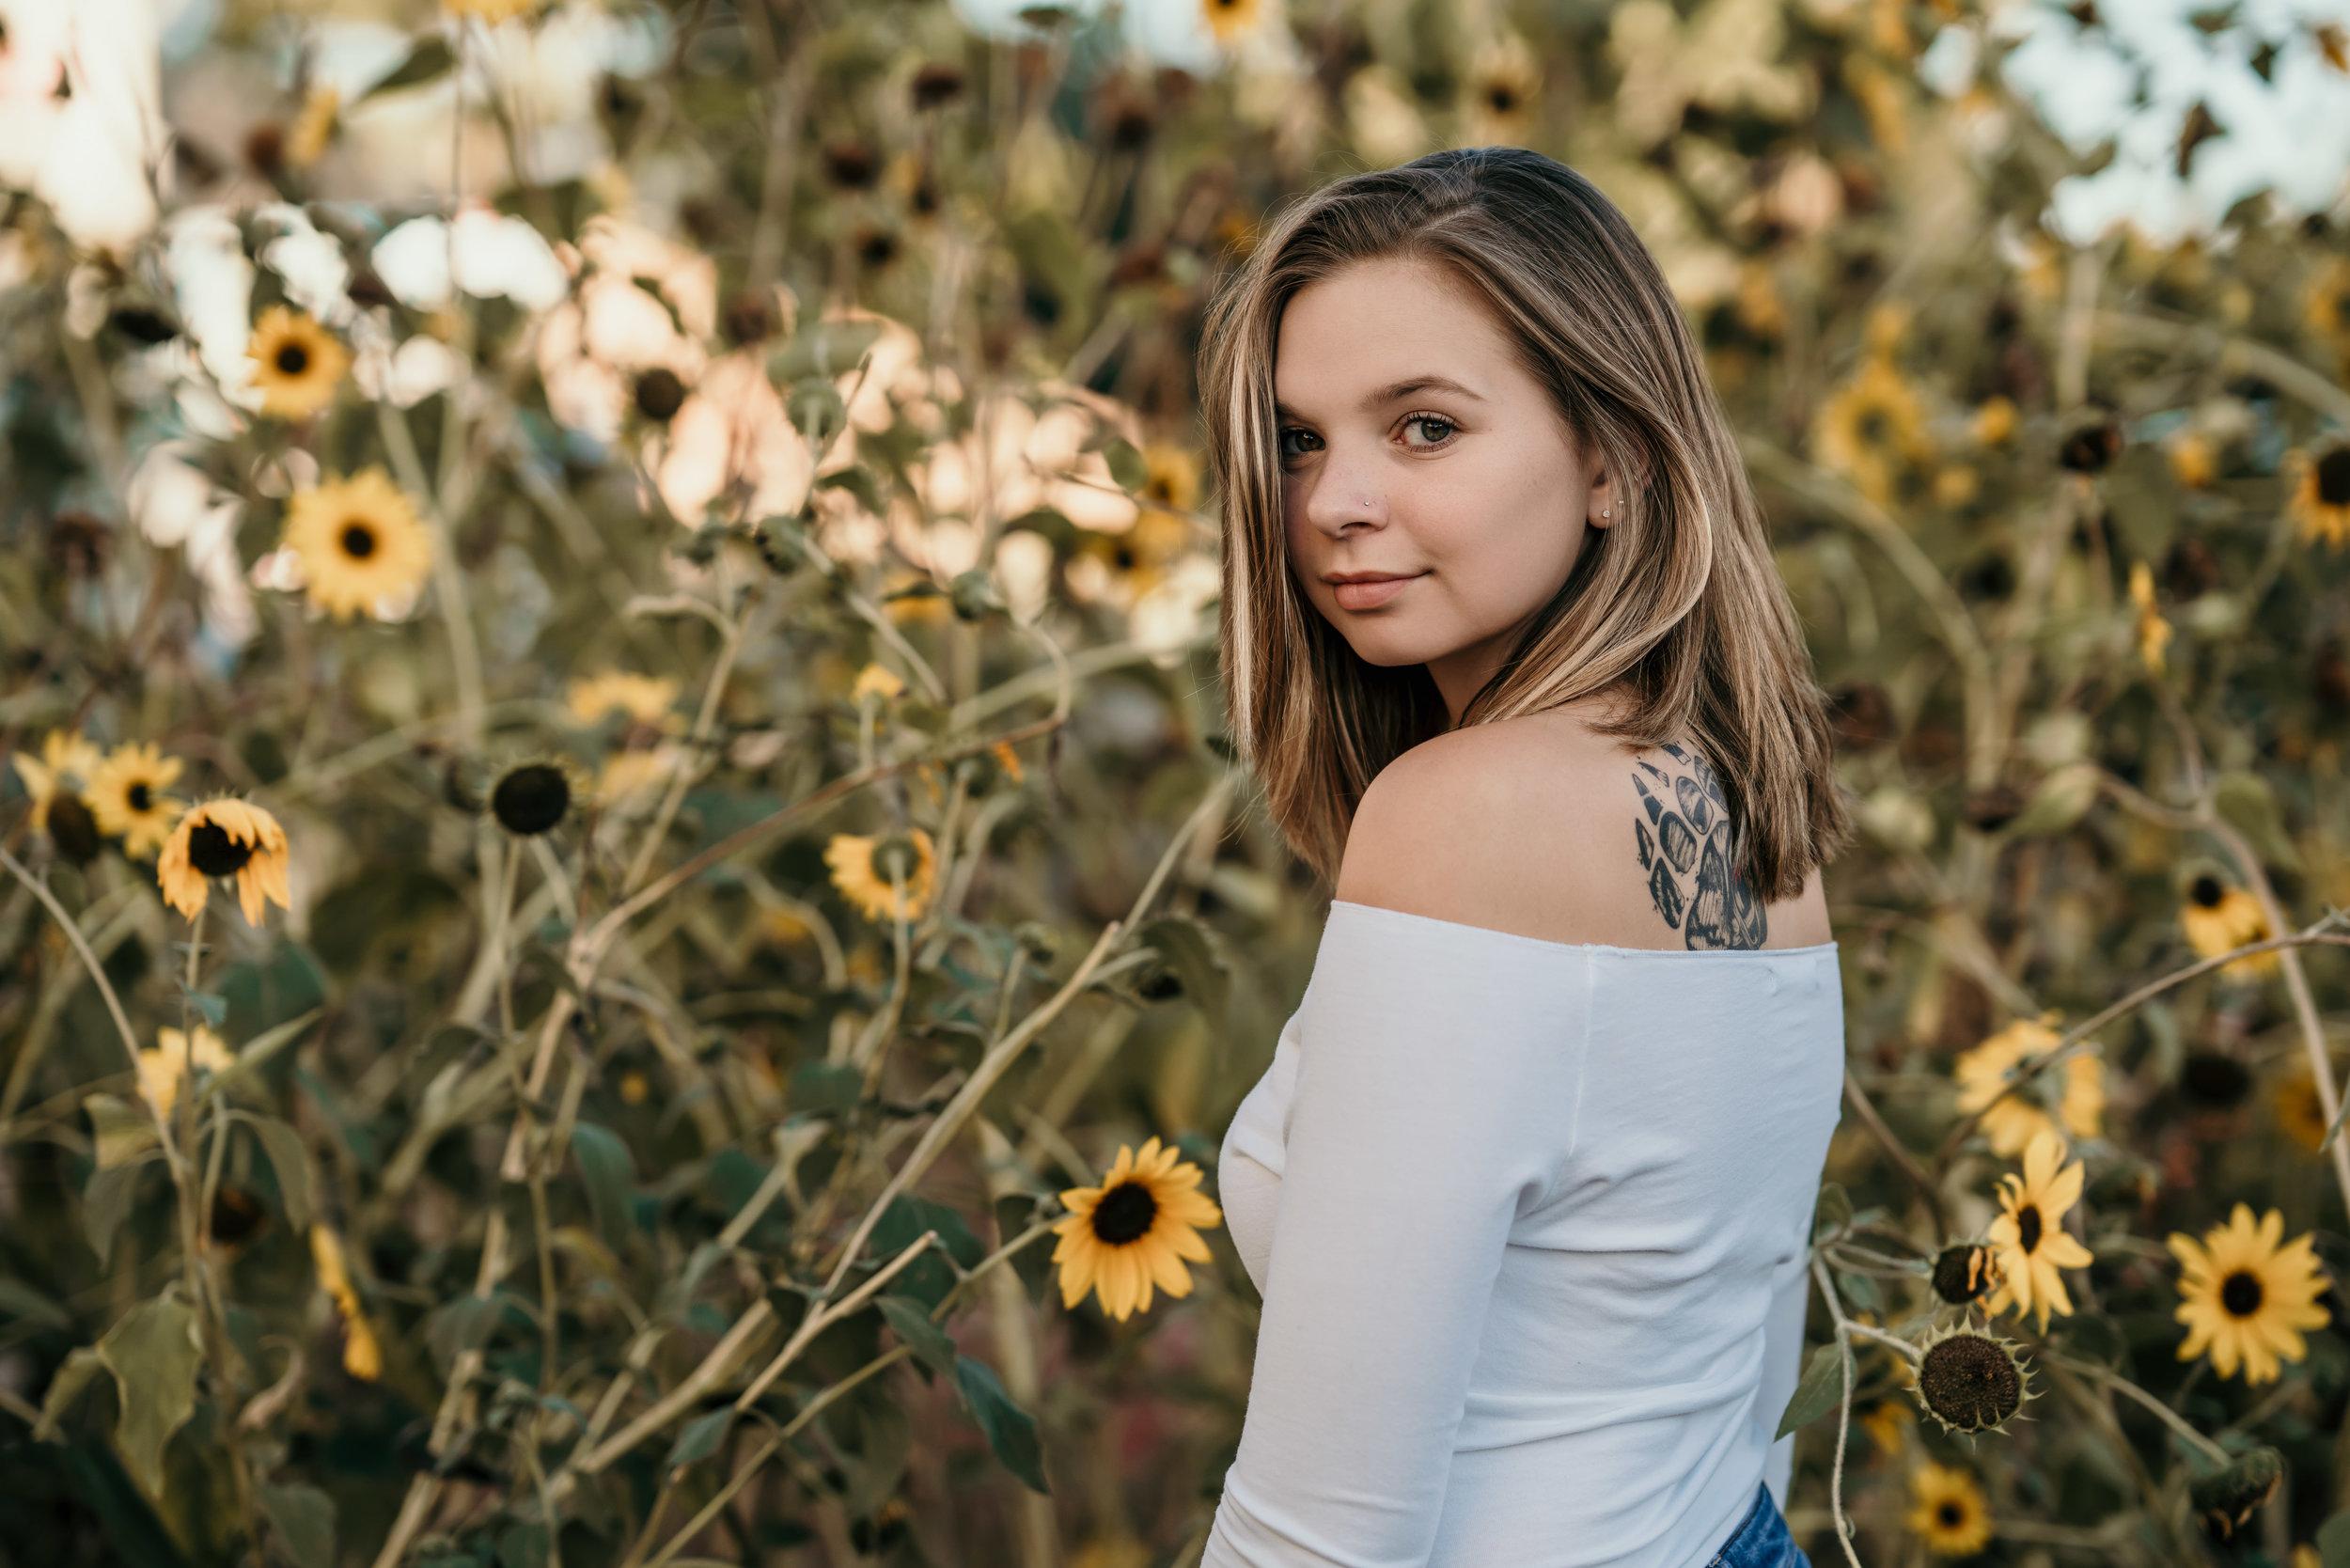 denver senior pictures in sunflowers